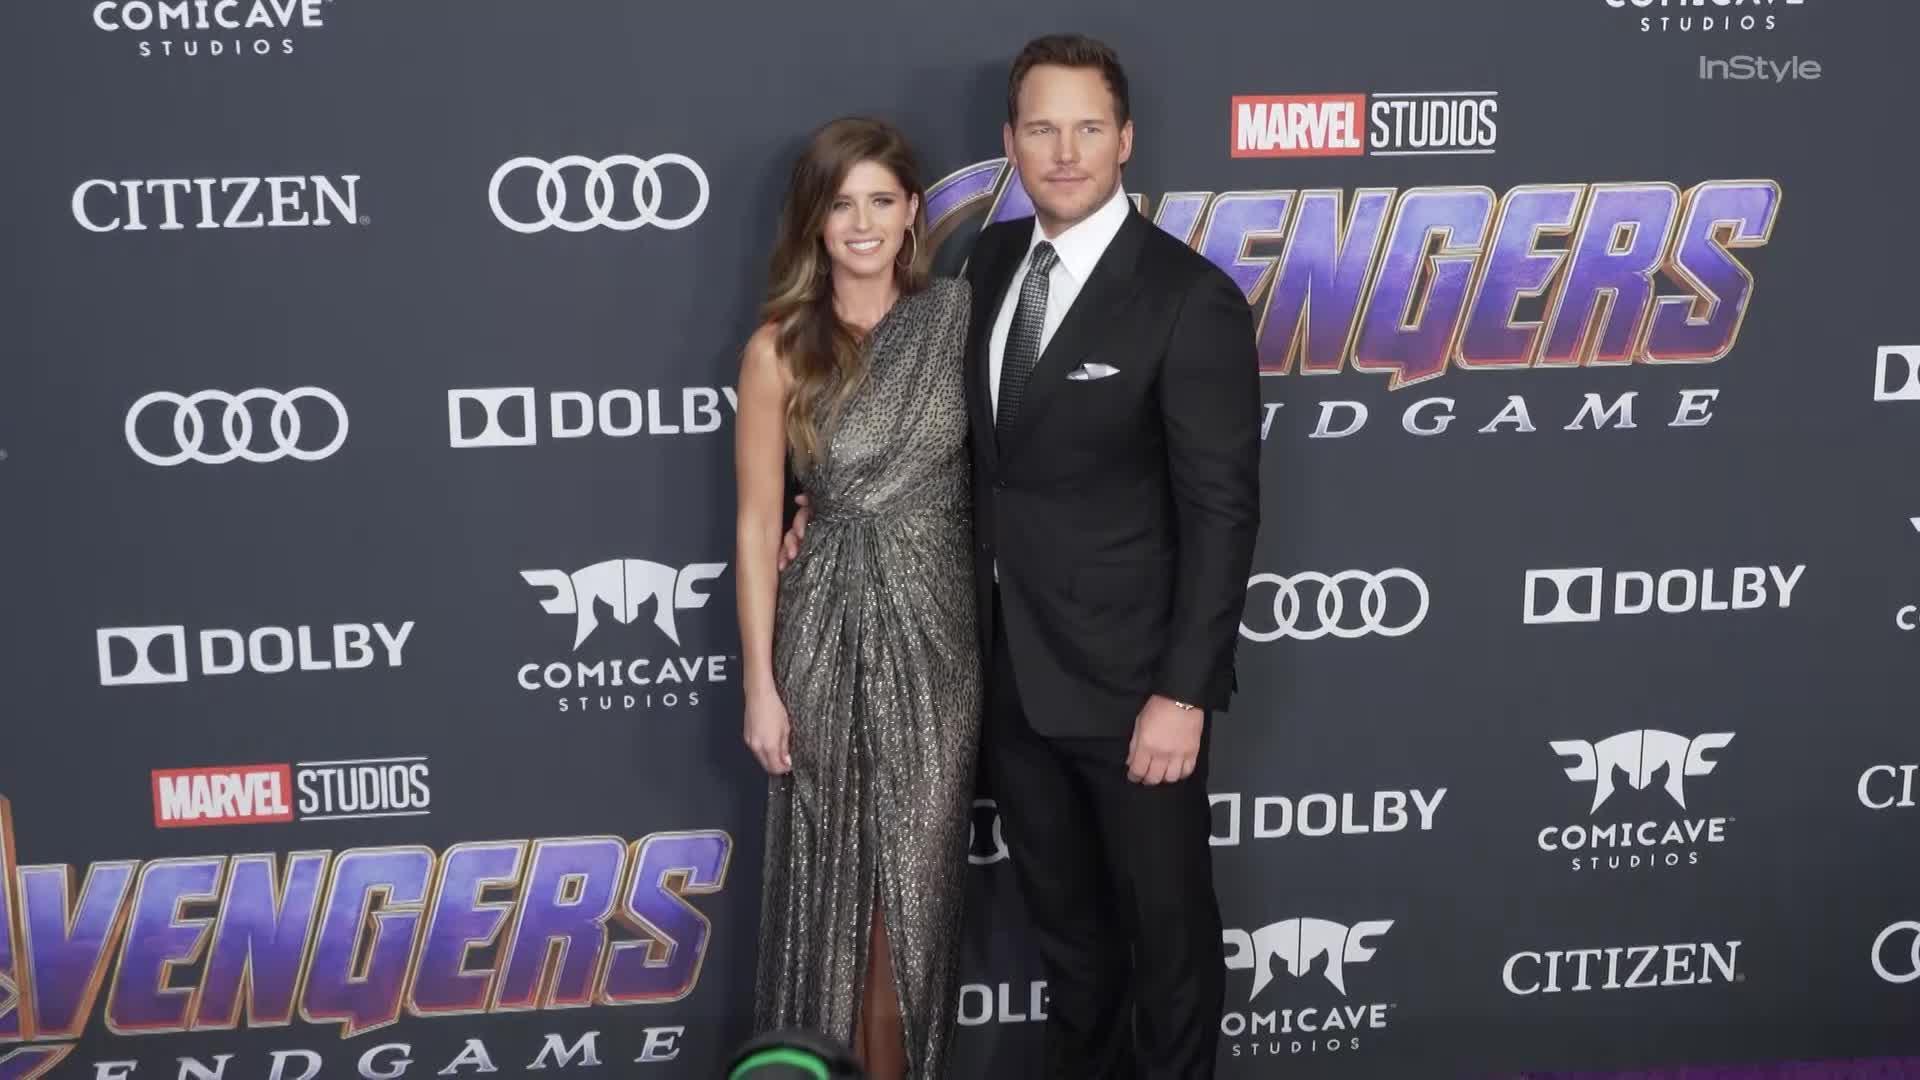 Chris Pratt and Katherine Schwarzenegger Just Made Their Red Carpet Debut